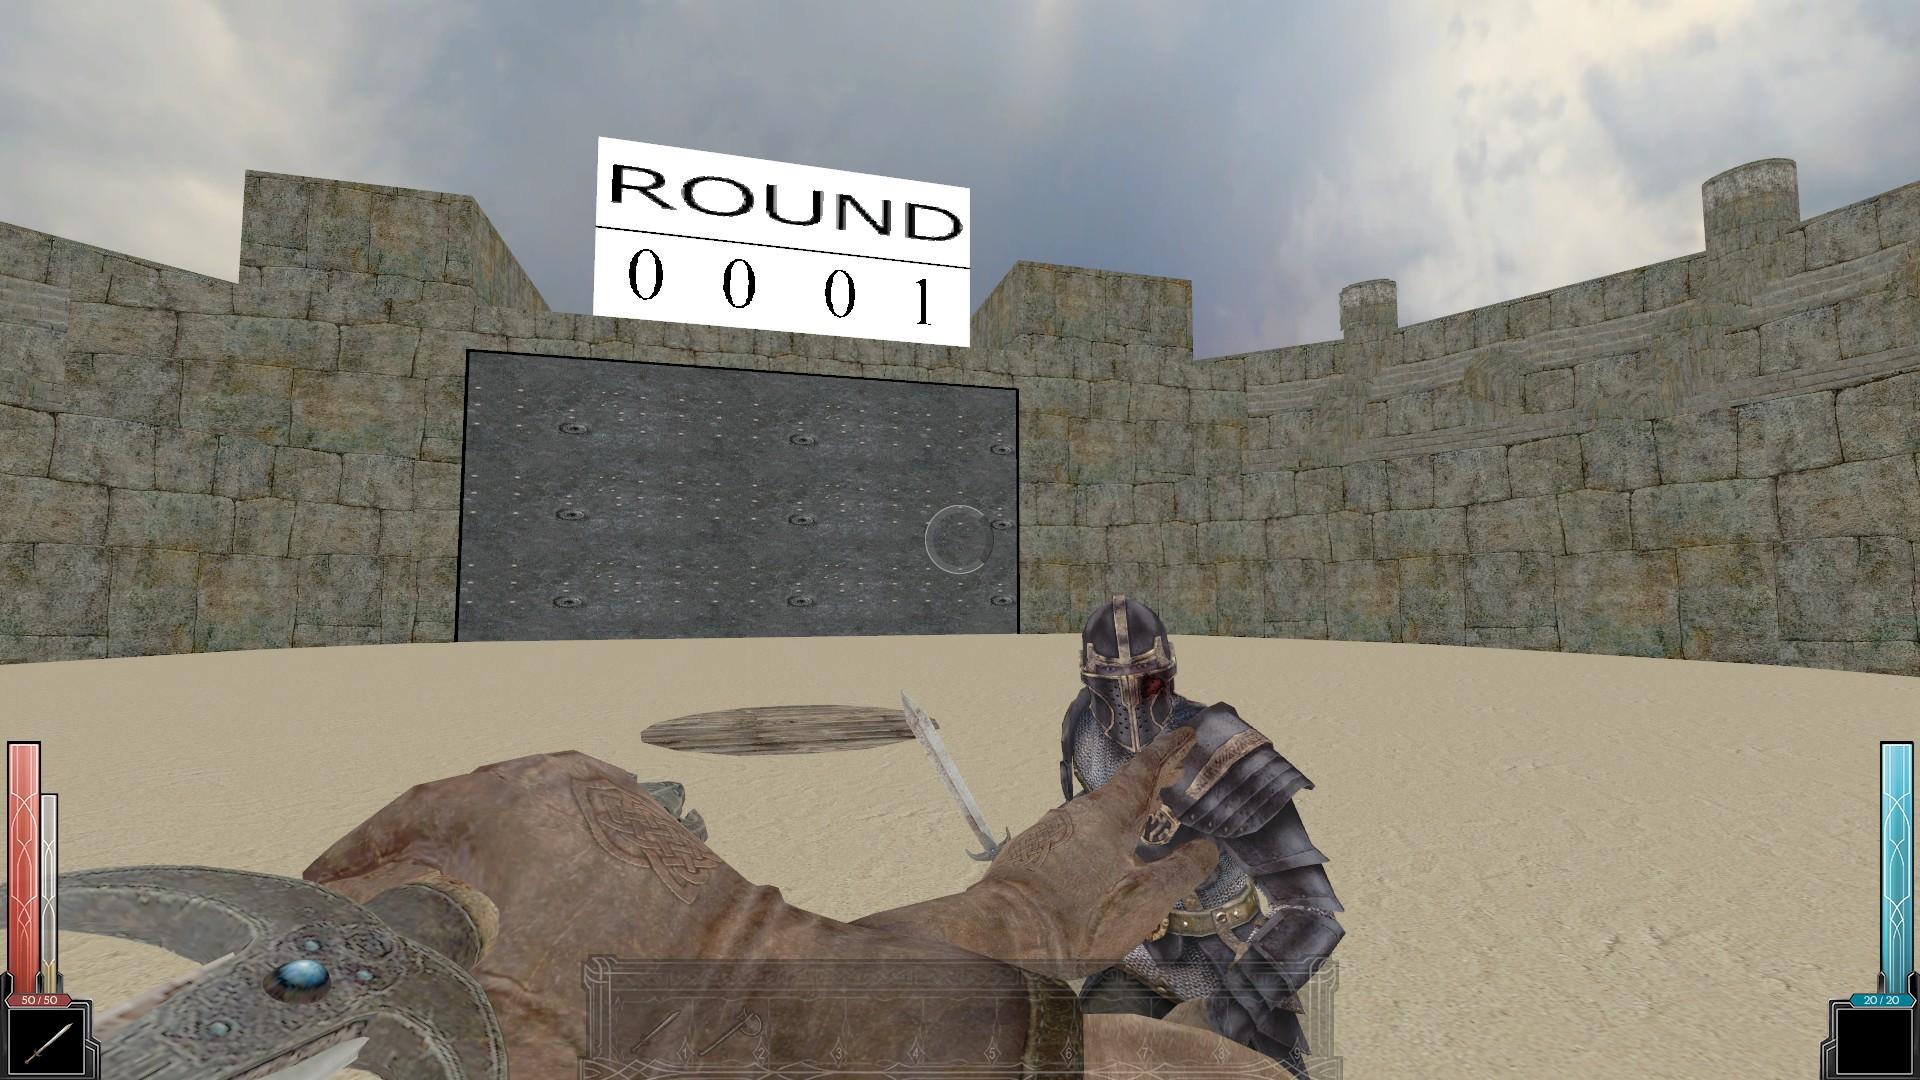 Arena Image